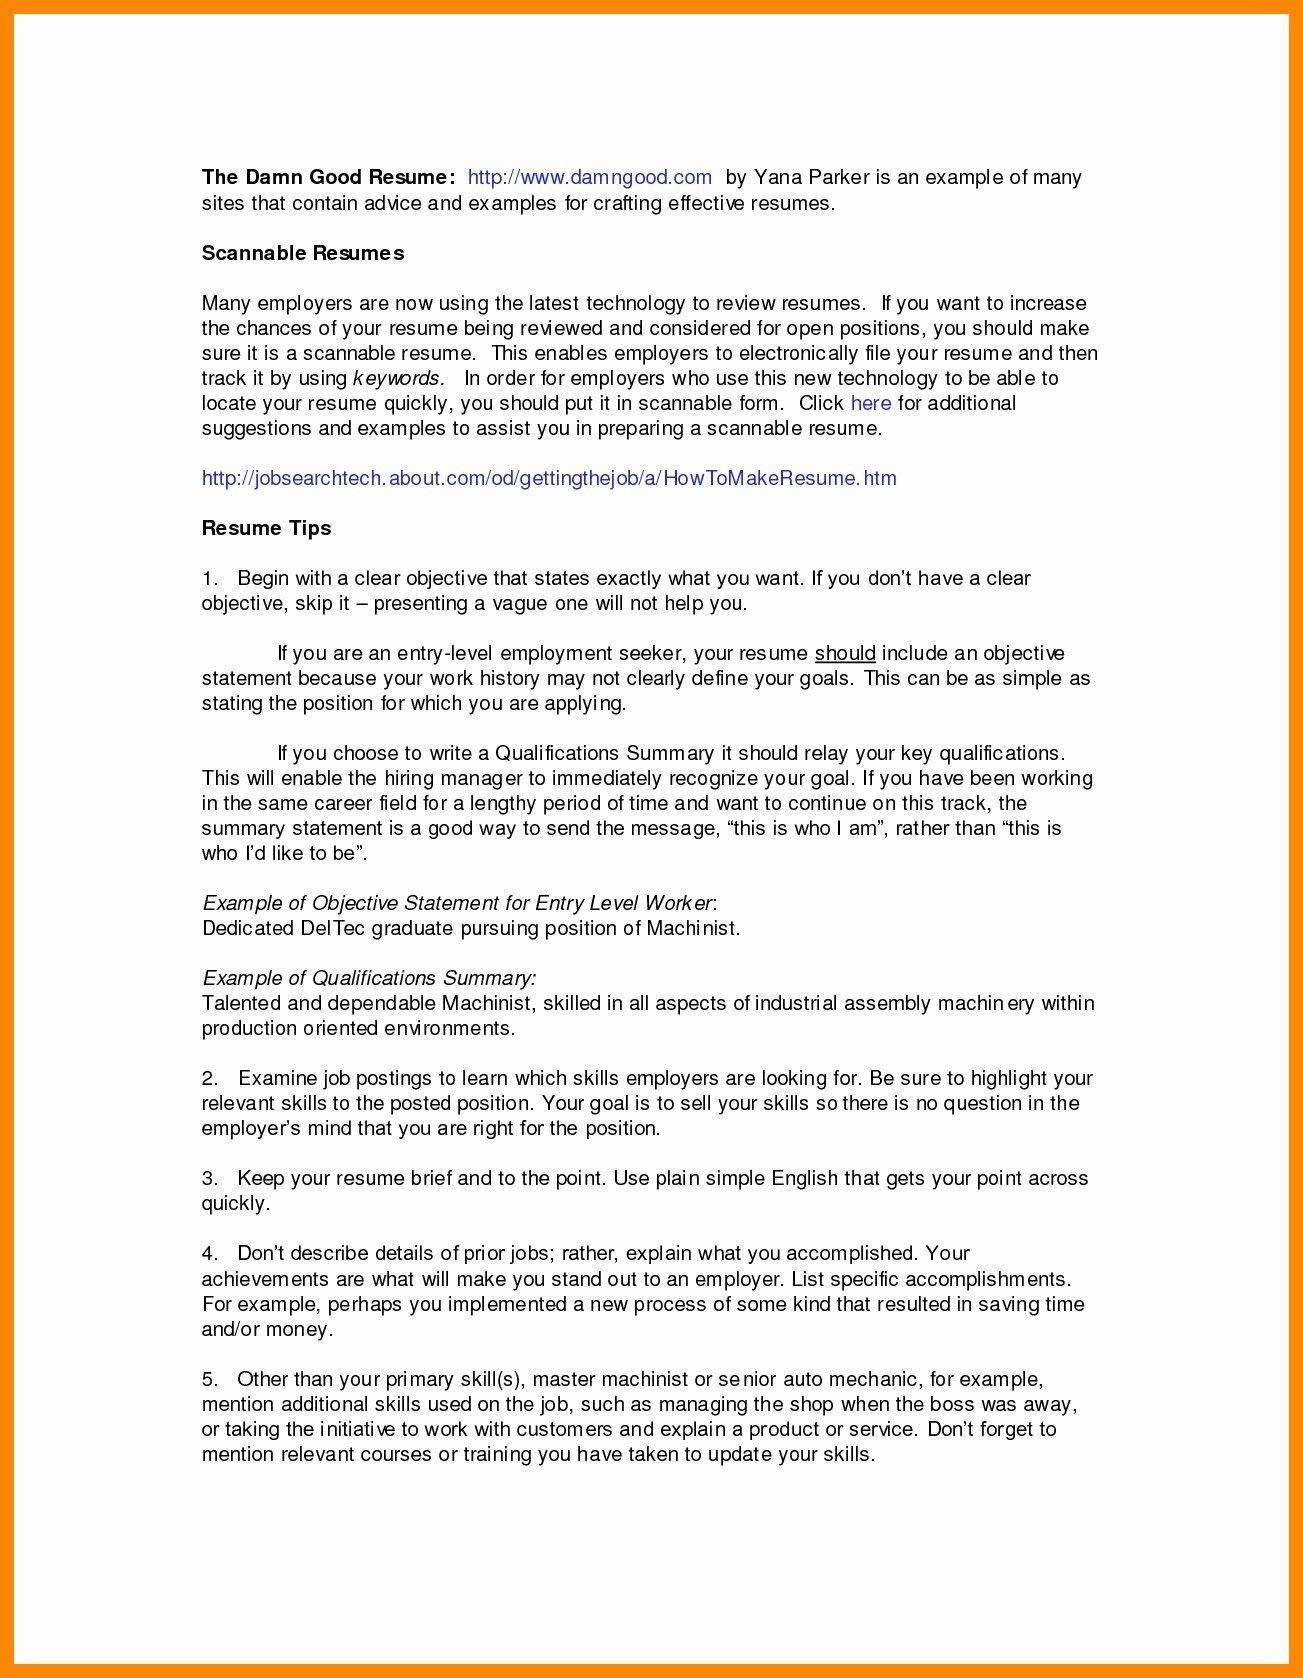 Factors Of Production Worksheet Factors Production Worksheet Answers Nidecmege